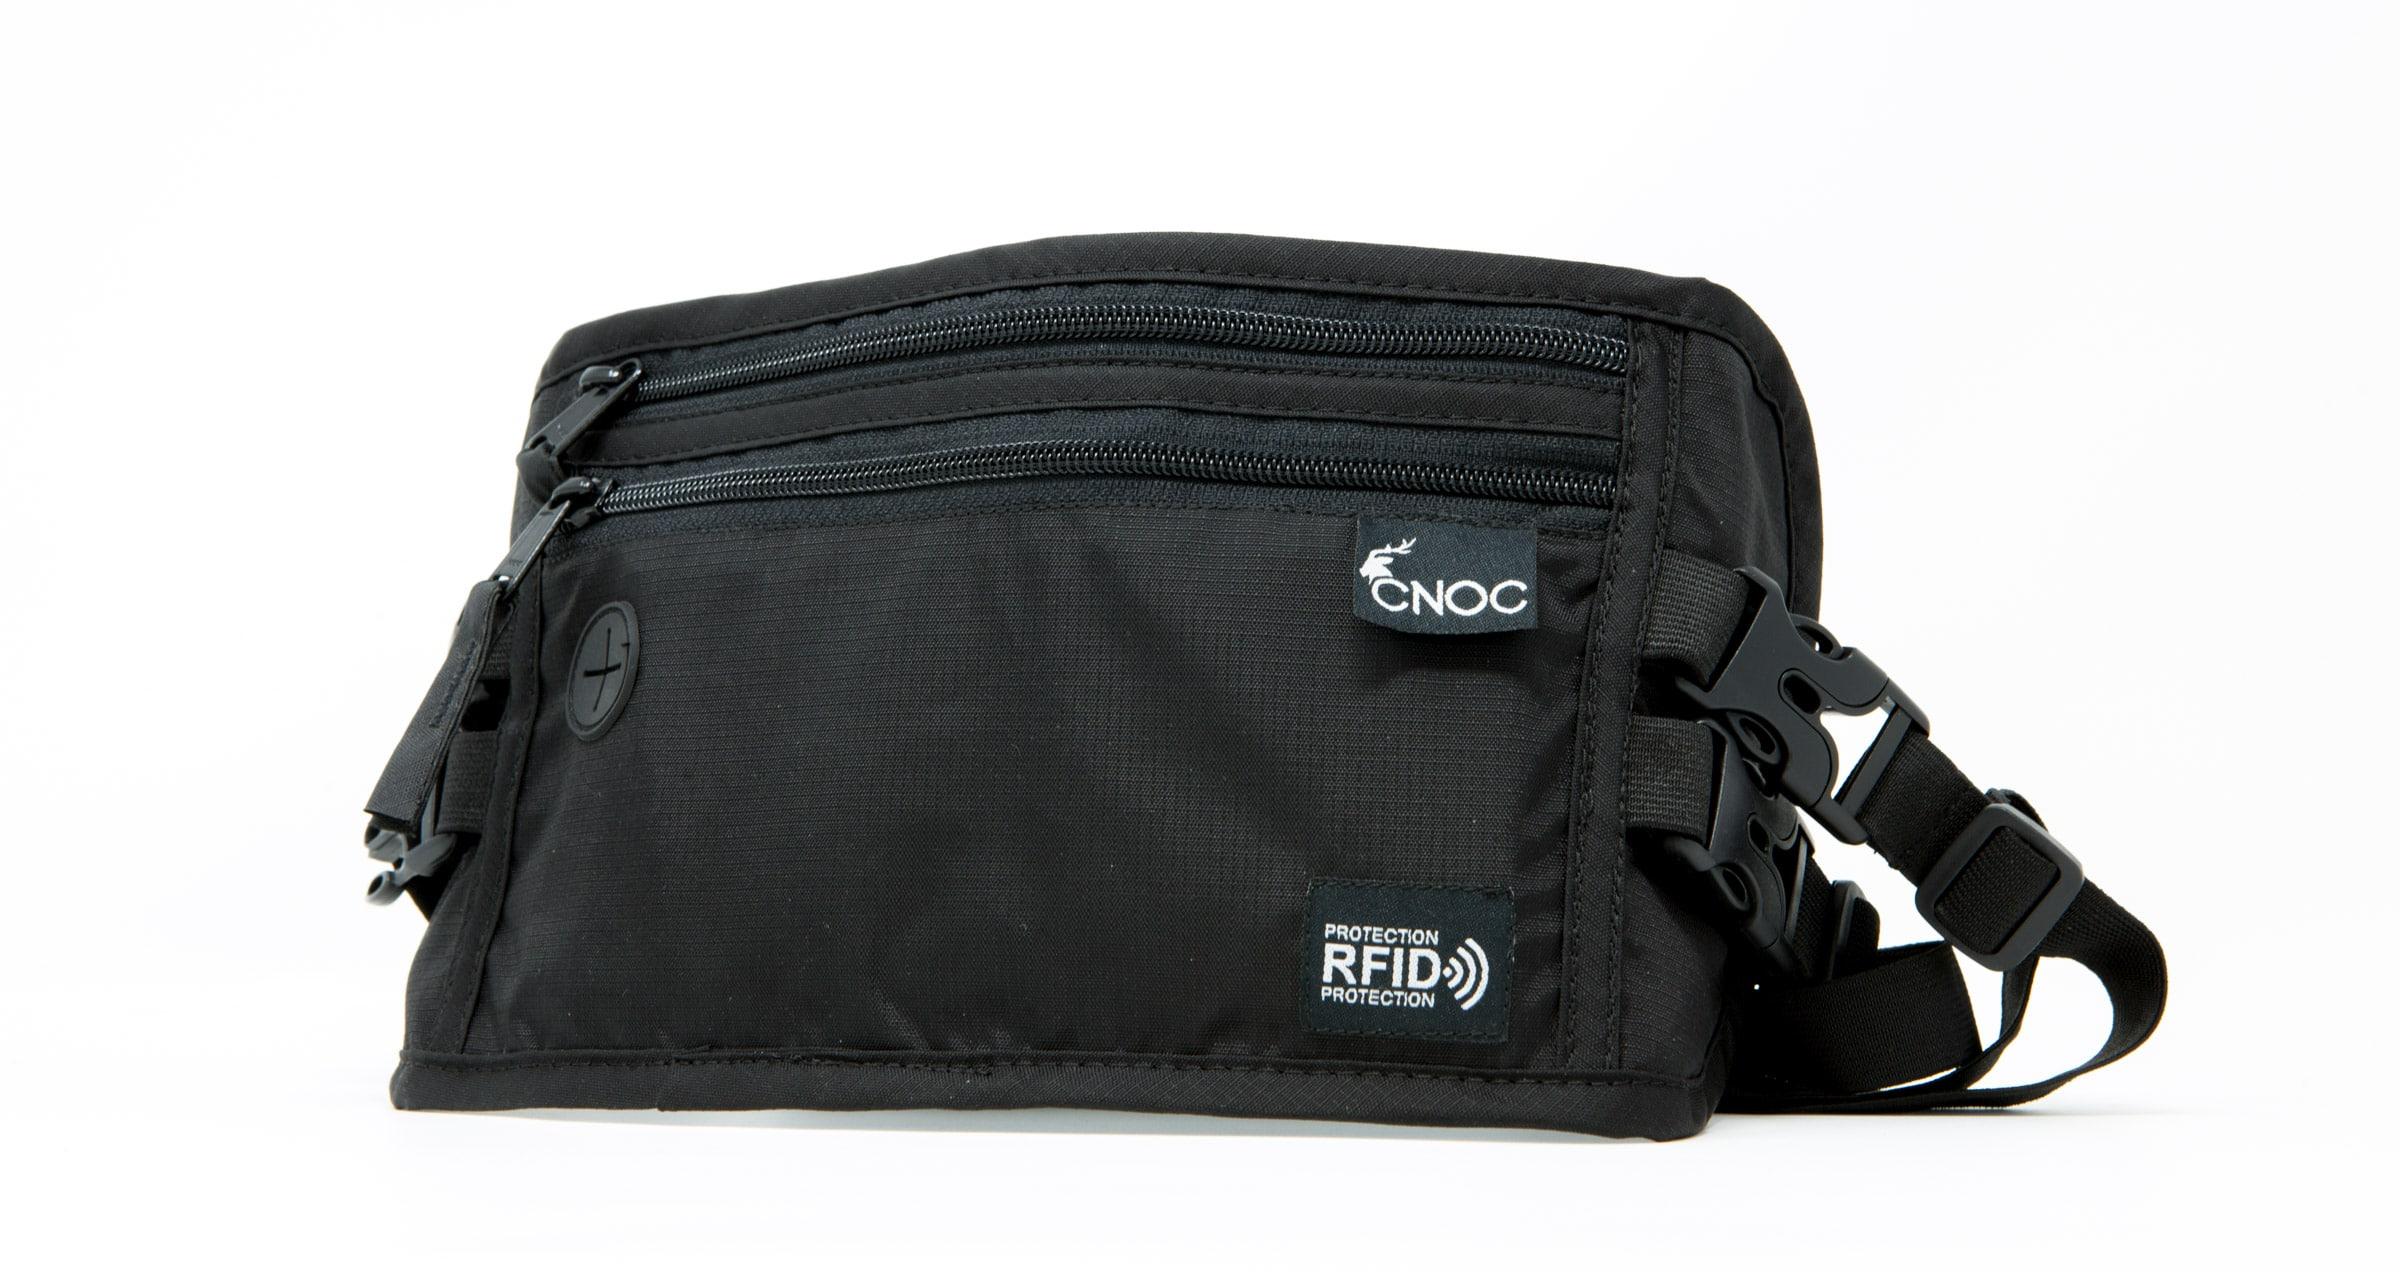 CNOC RFID Brustbeutel Test